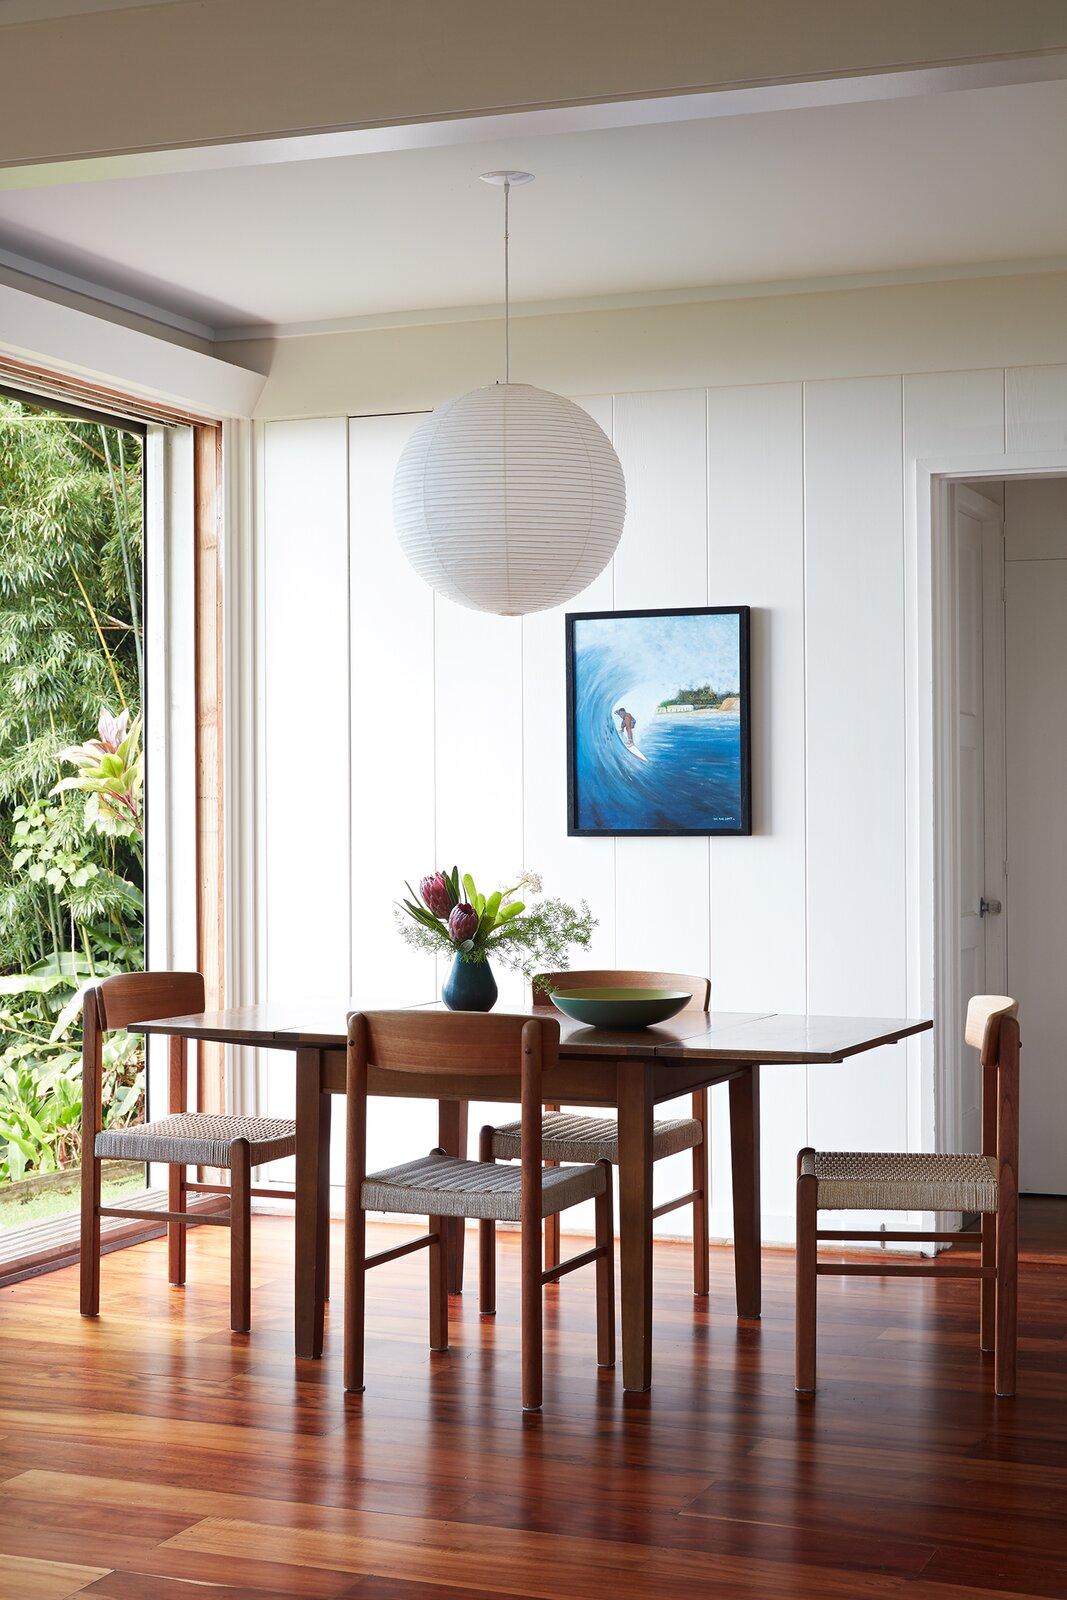 The Tantalus Studio dining room